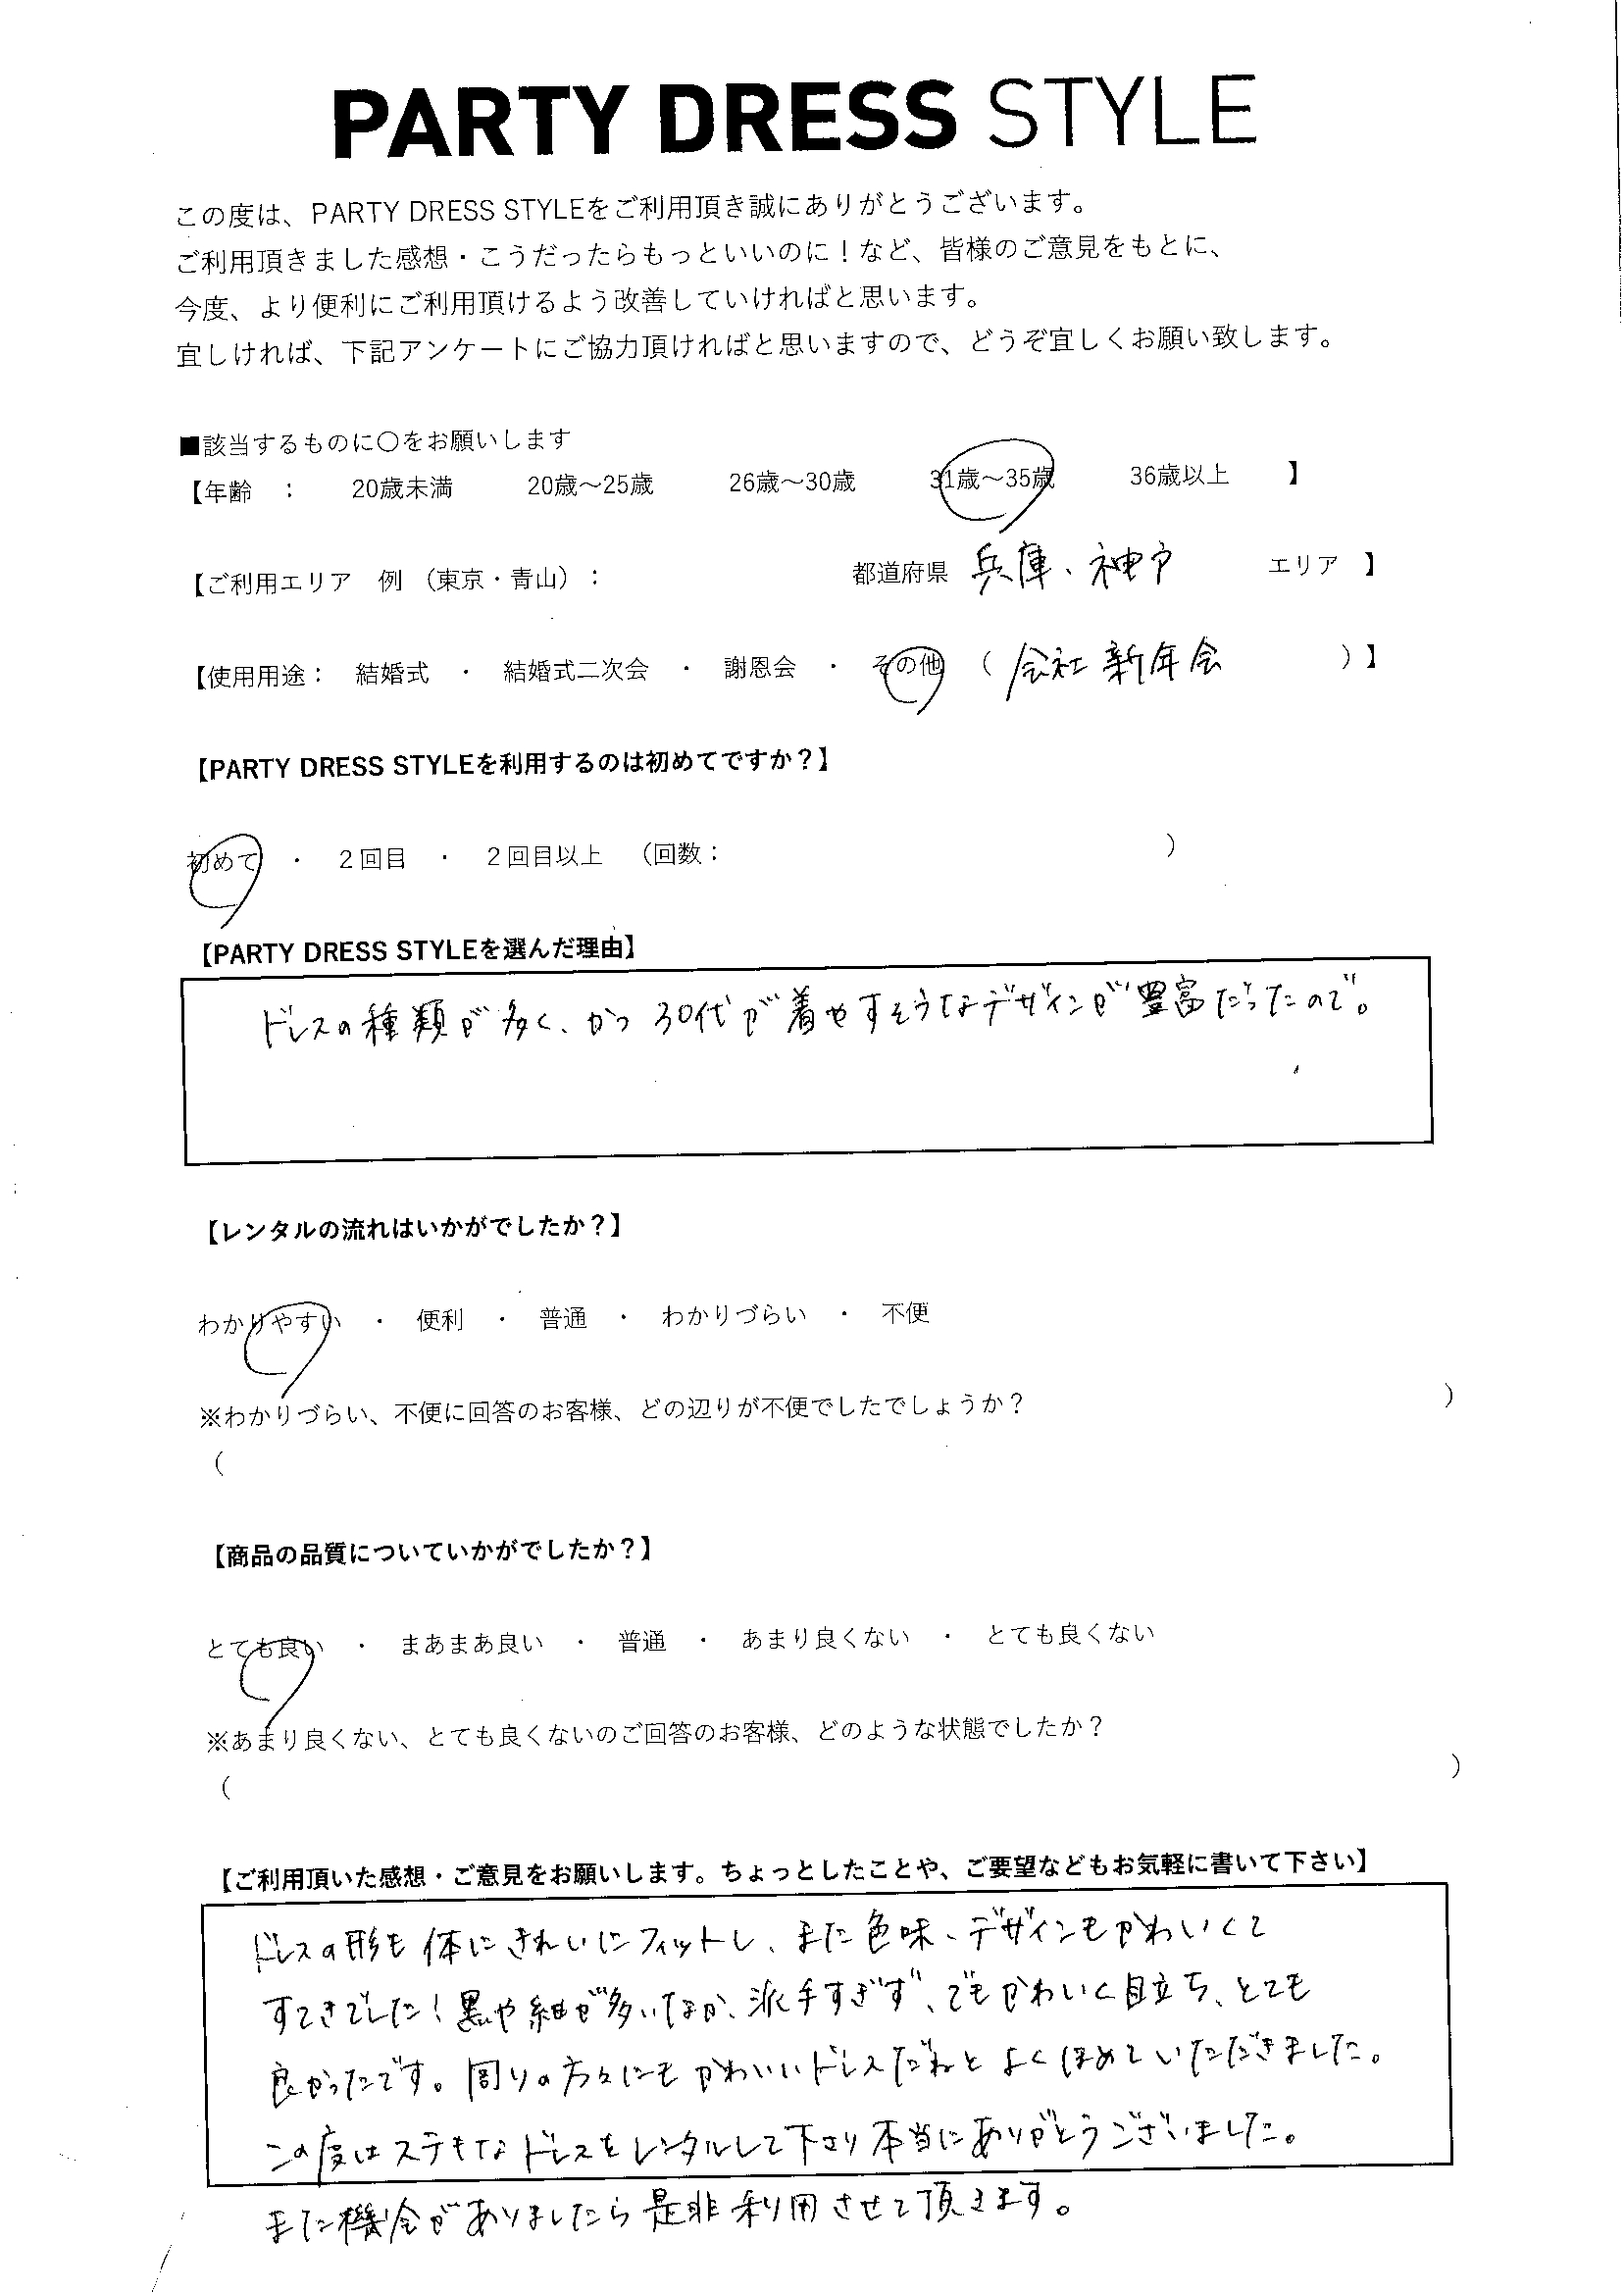 1/25会社新年会ご利用 兵庫・神戸エリア